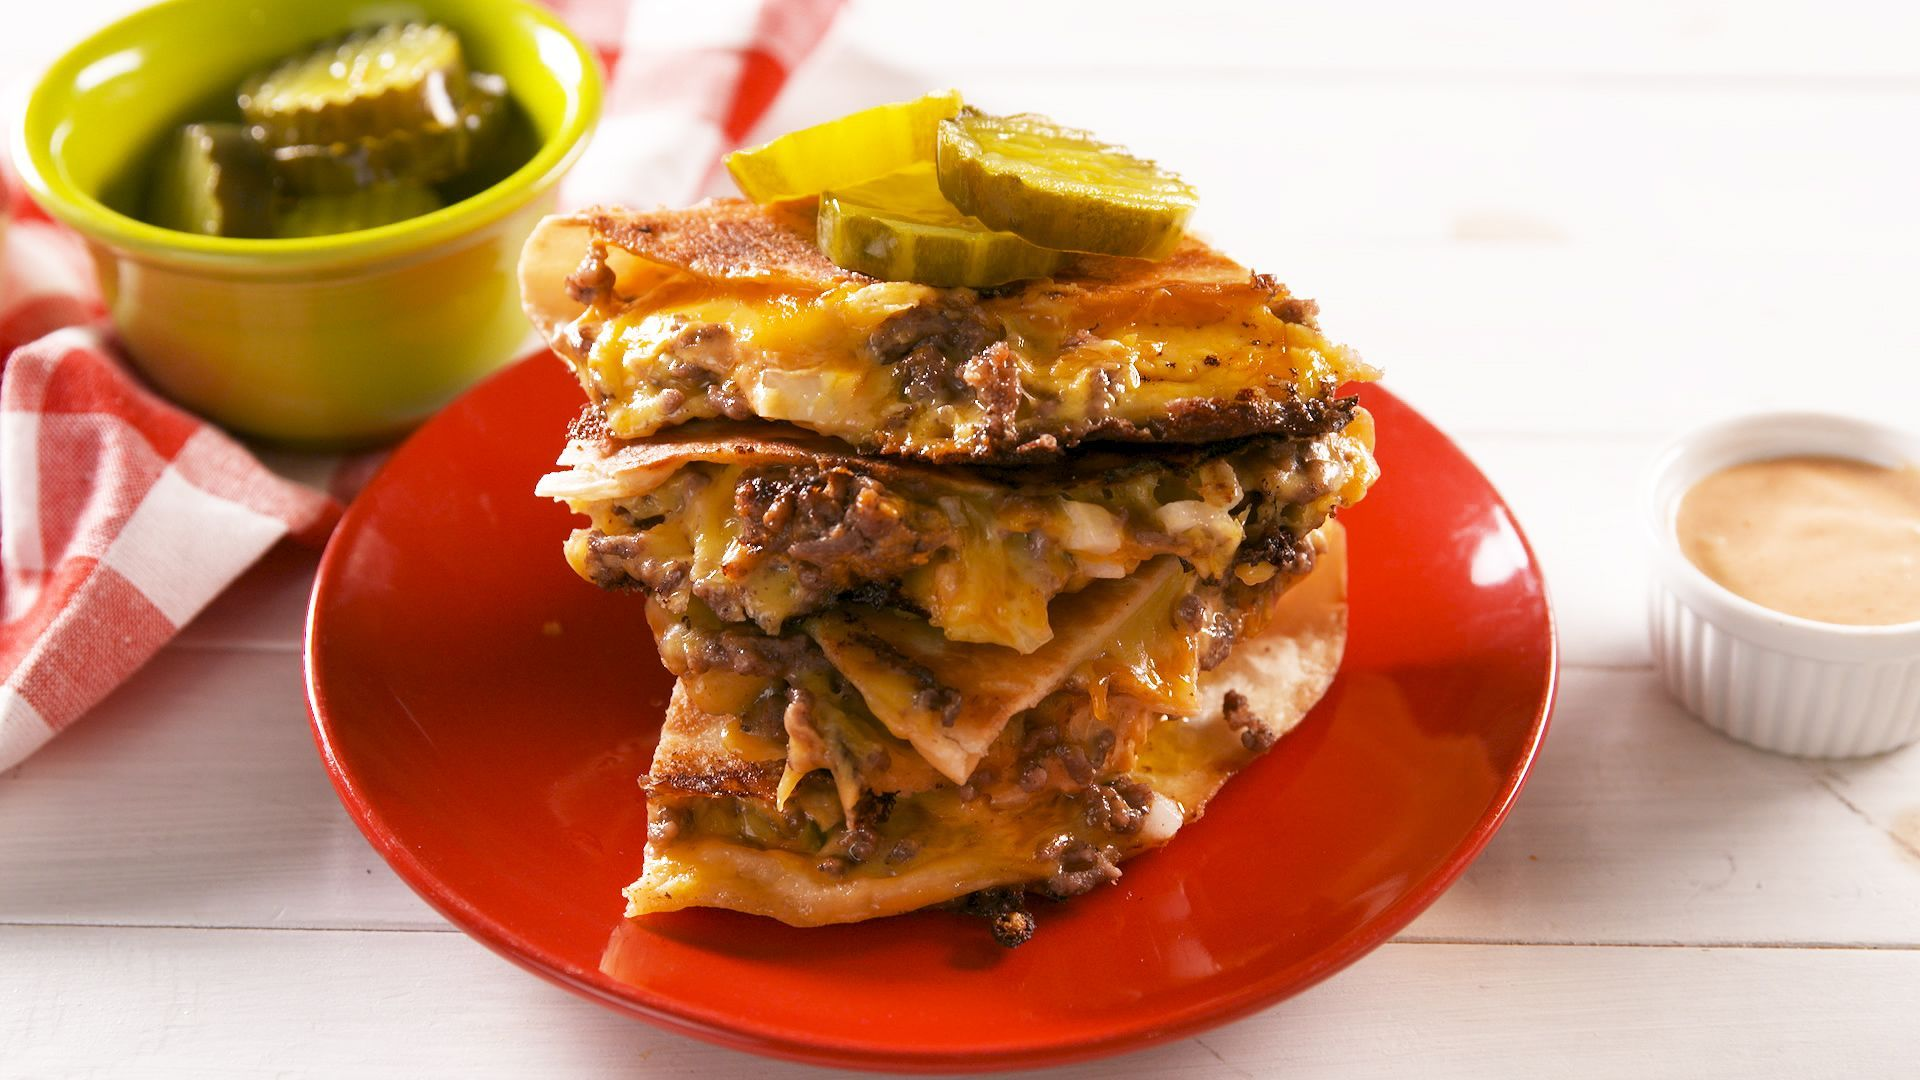 Big Mac Quesadillas 5 Trending Recipes With Videos Recipe Weeknight Dinner Recipes Easy Quesadilla Recipes